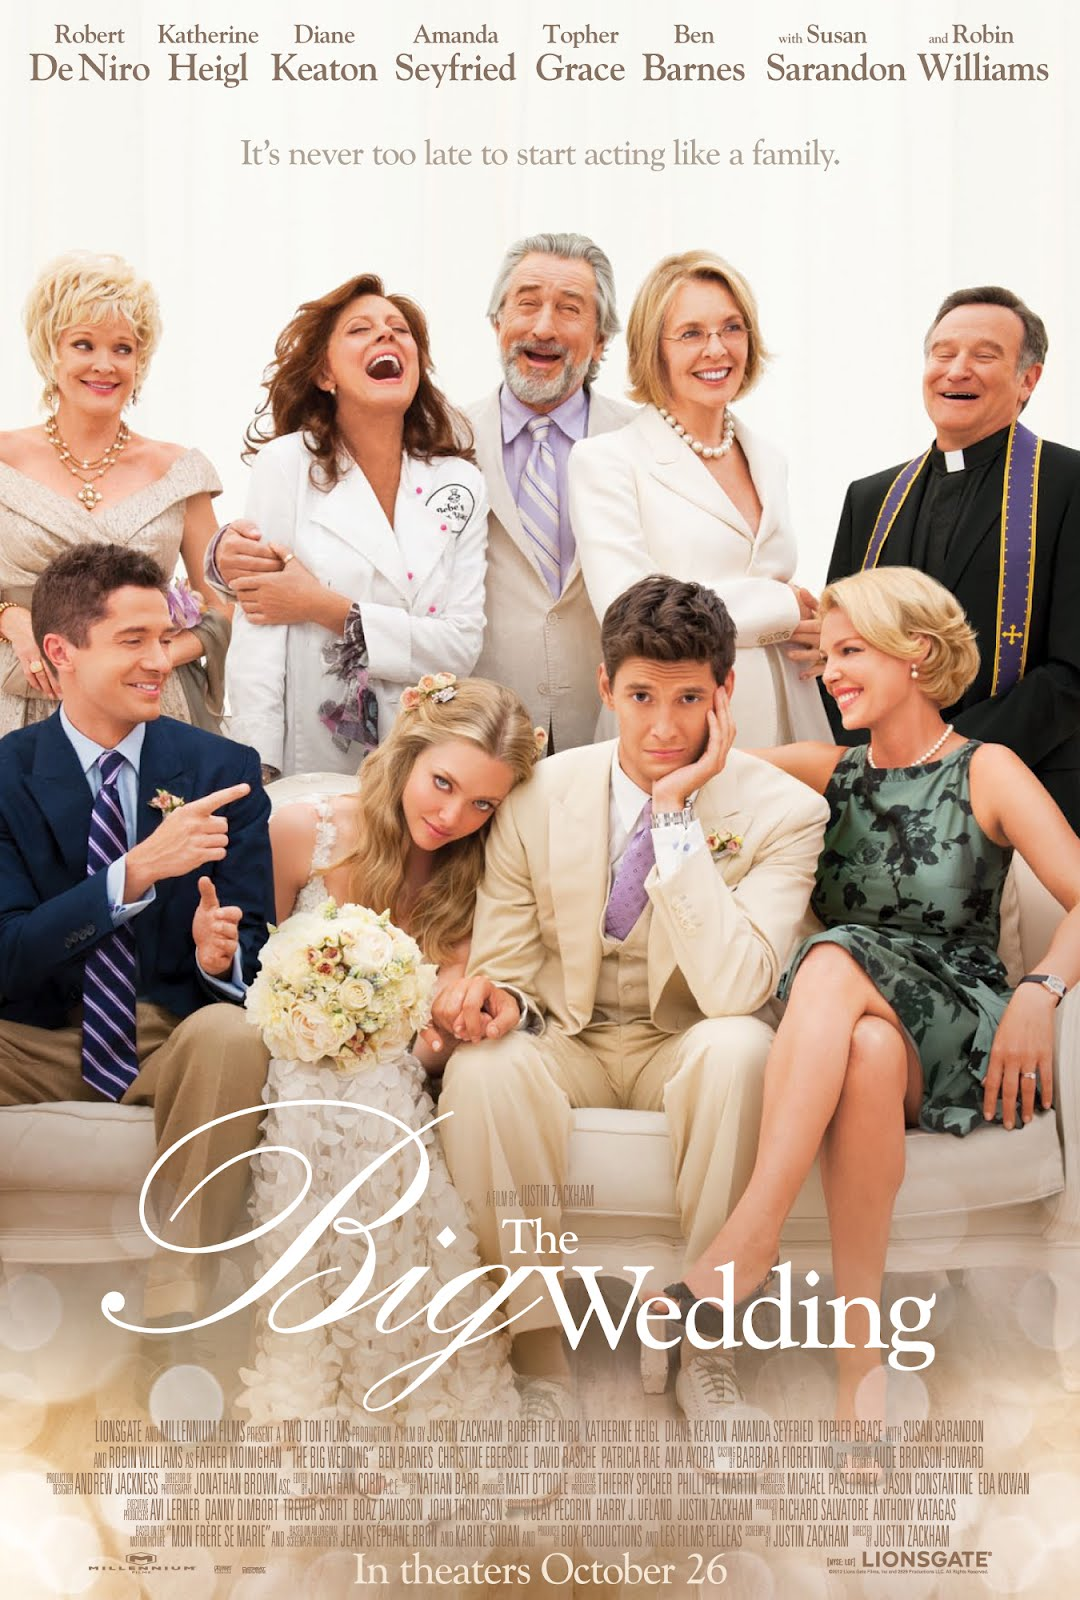 http://4.bp.blogspot.com/-Zib4dL6Guyk/UBlIJPJYvHI/AAAAAAAAF8I/2mEasDR81ks/s1600/the-big-wedding-movie-poster.jpg